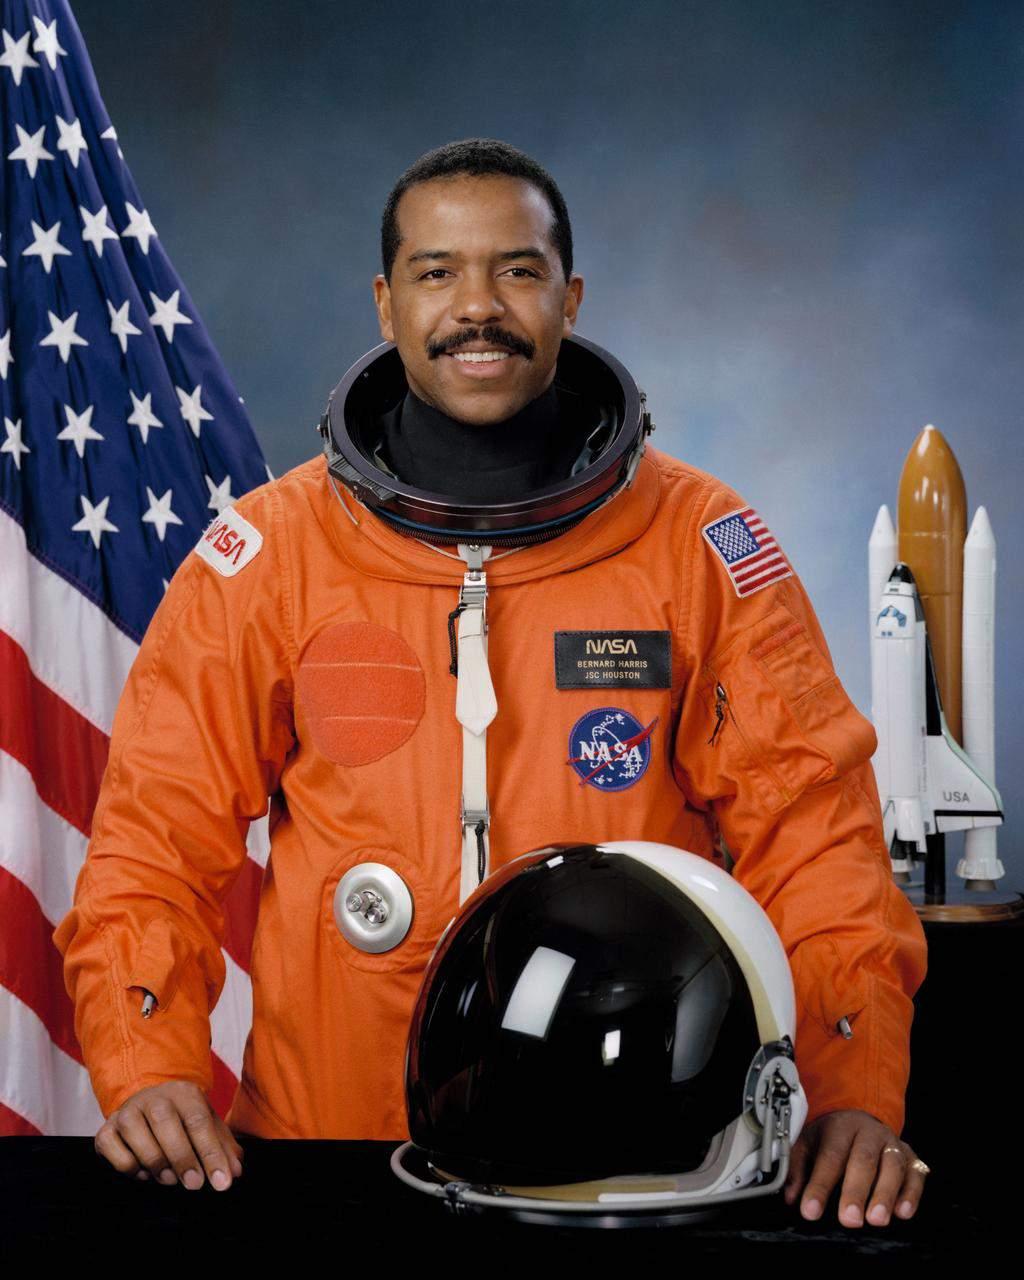 Bernard Harris, astronaut